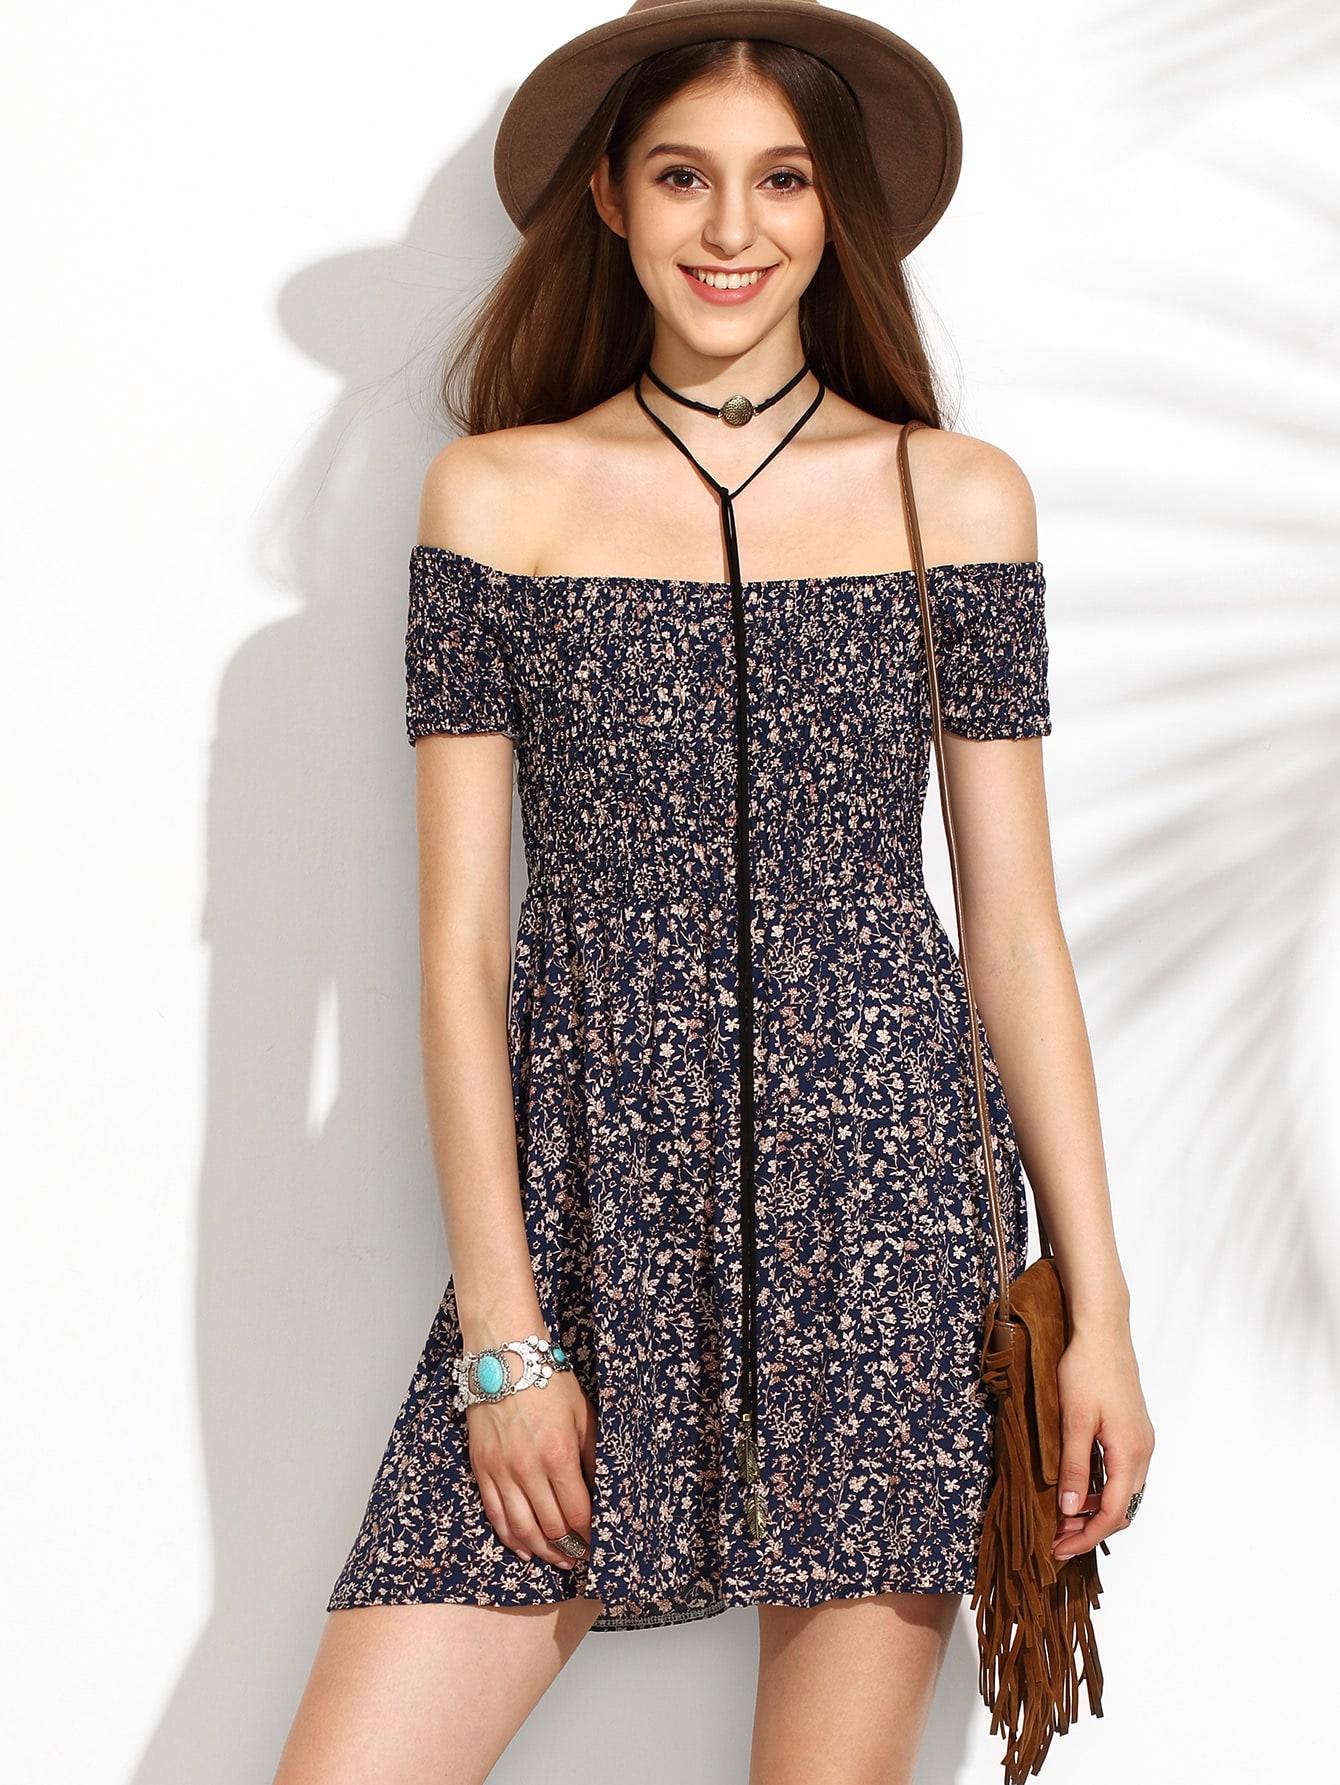 Calico Print Bardot Neckline Flare Dress bardot neckline scallop hem dress